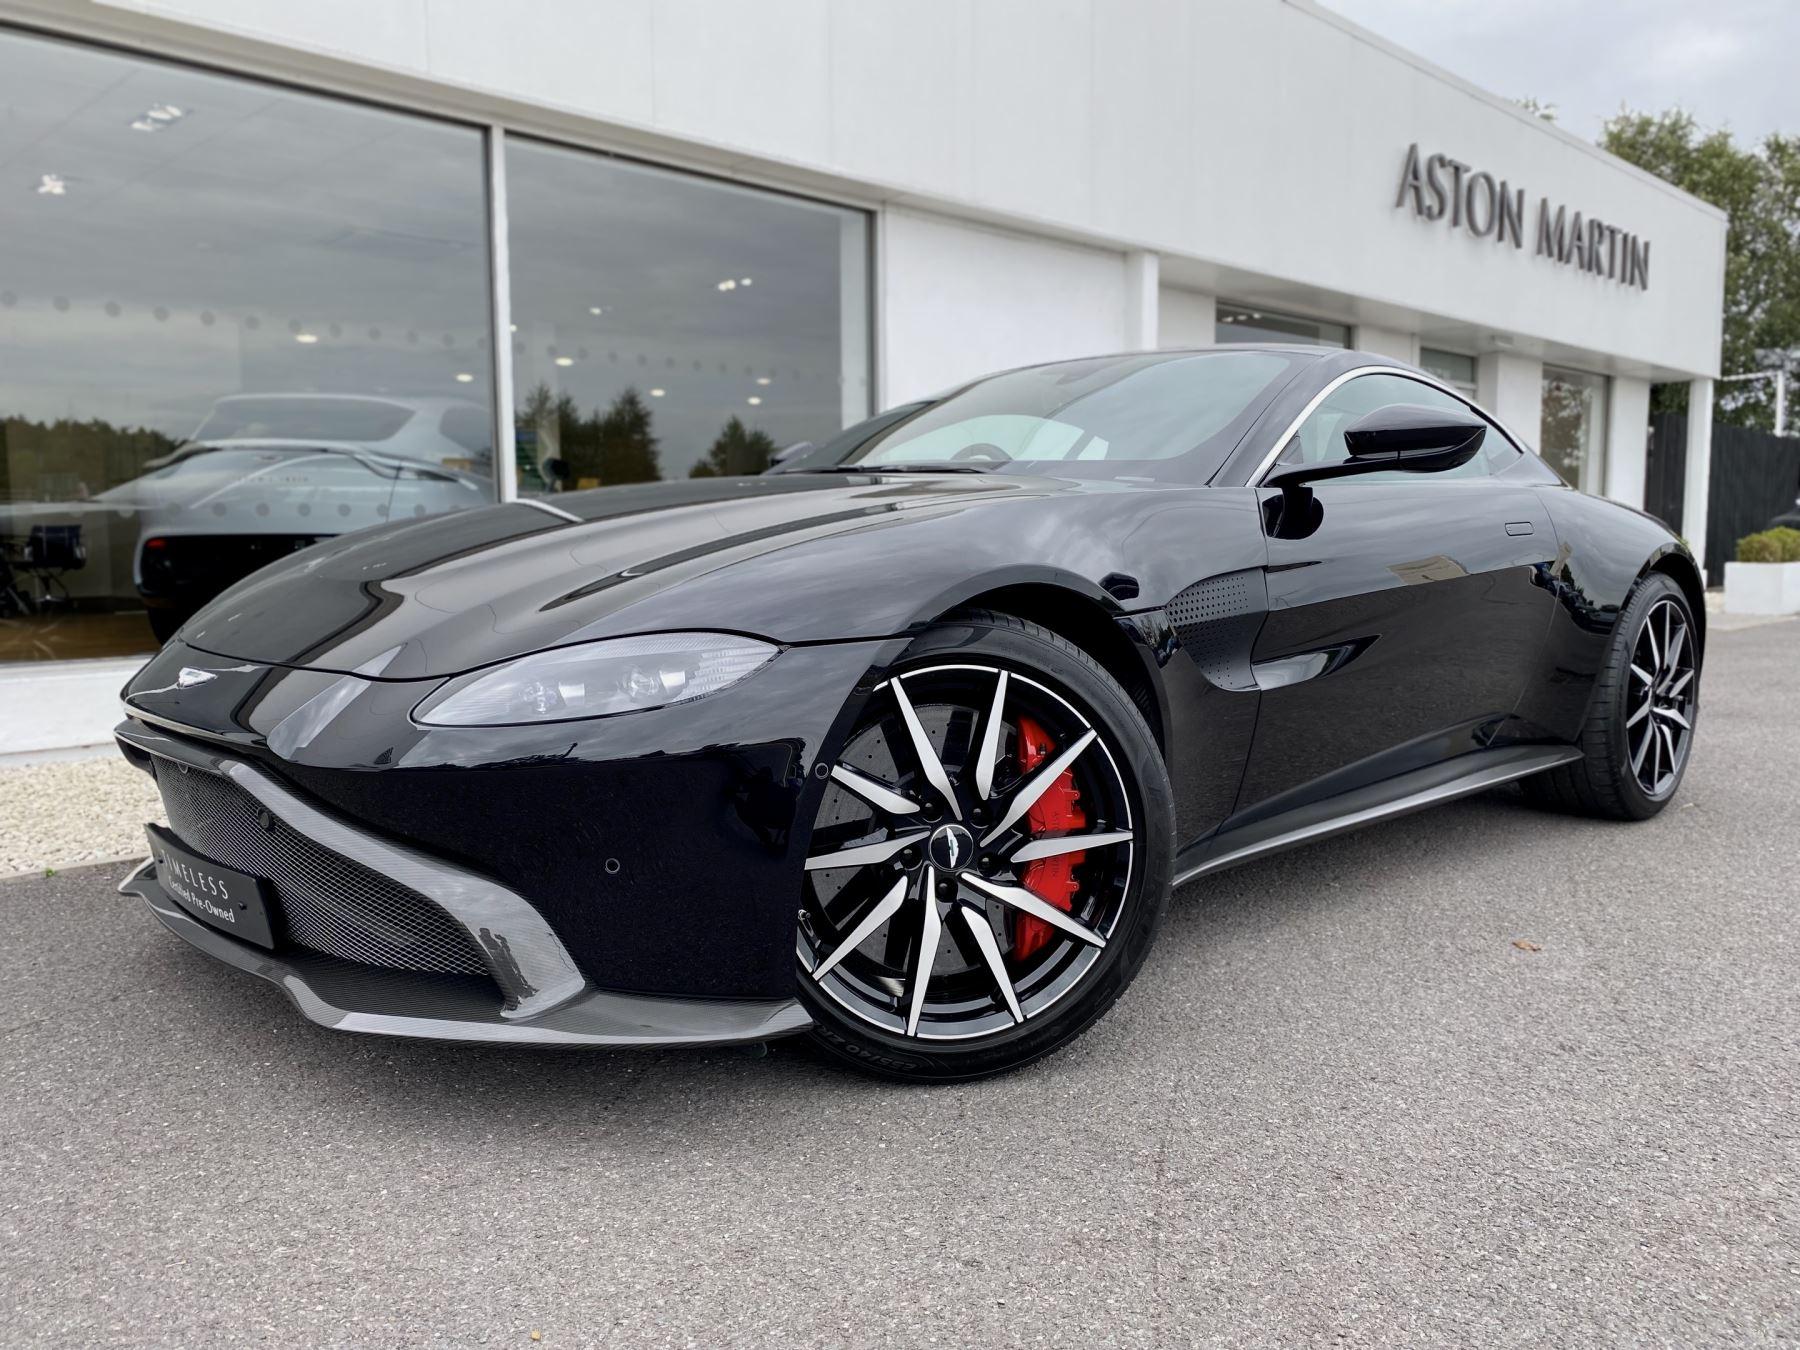 Aston Martin New Vantage 2dr ZF 8 Speed Auto. 4.0 Twin Turbo ZF Gearbox  Reversing Camera Heated Seats Ceramic Brakes image 3